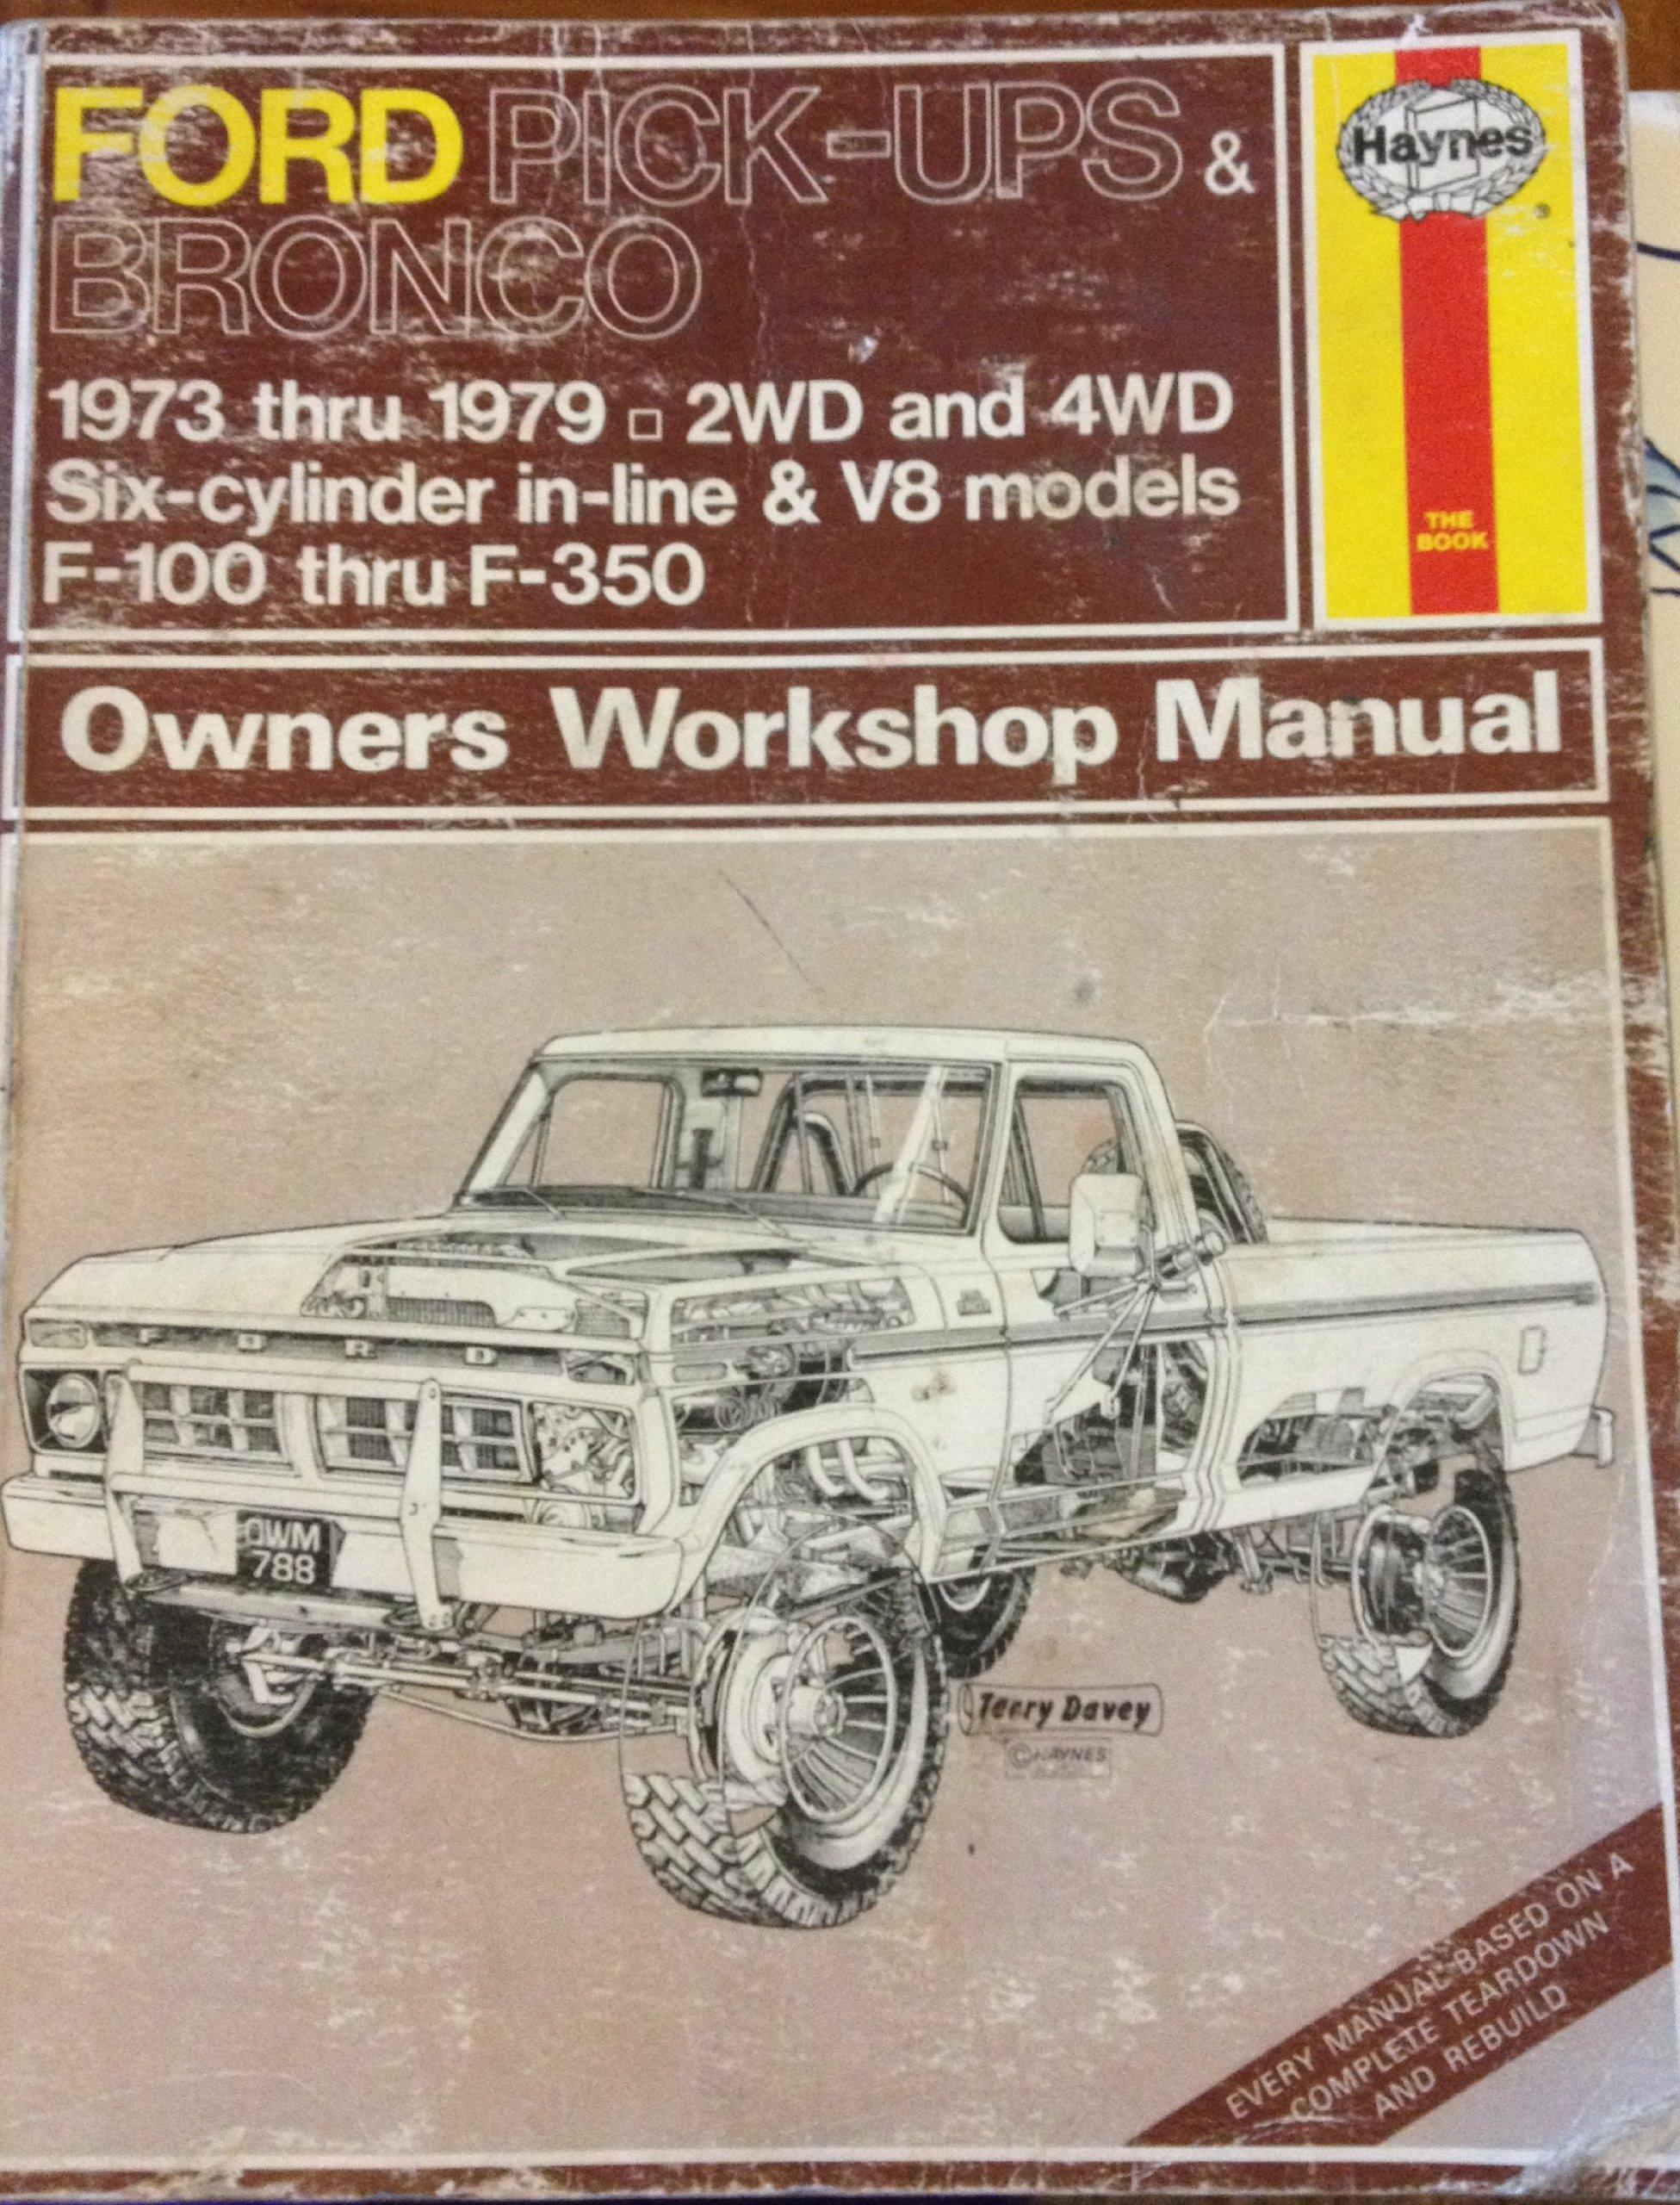 Ford Pick-ups & Bronco 1973 Thru 1979 Owner's Workshop Manual: Dennis;  Haynes, J.H. Yamaguchi: Amazon.com: Books